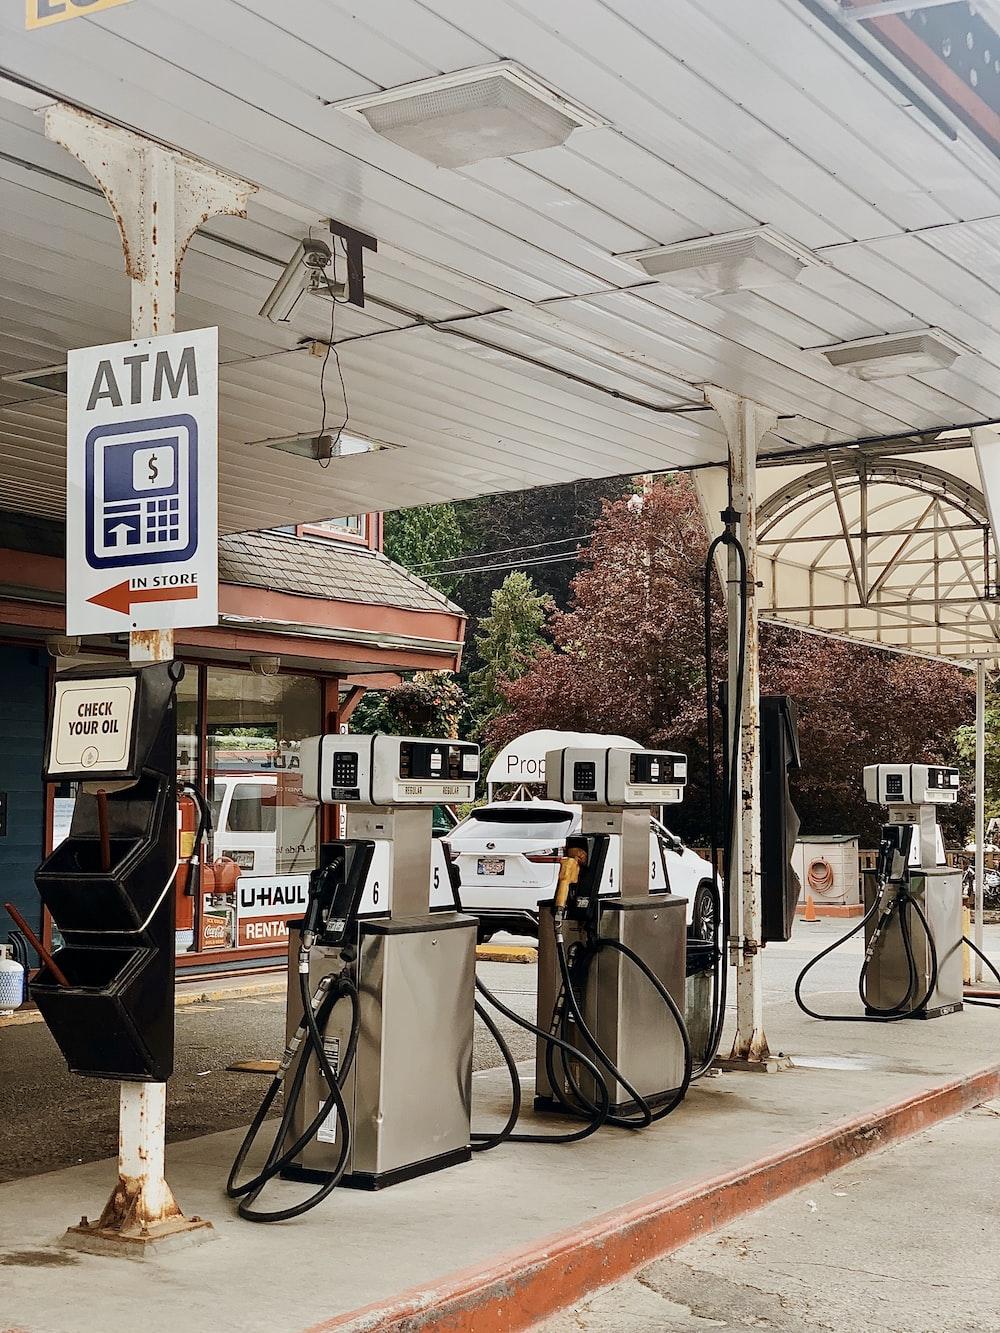 ATM signage near machines